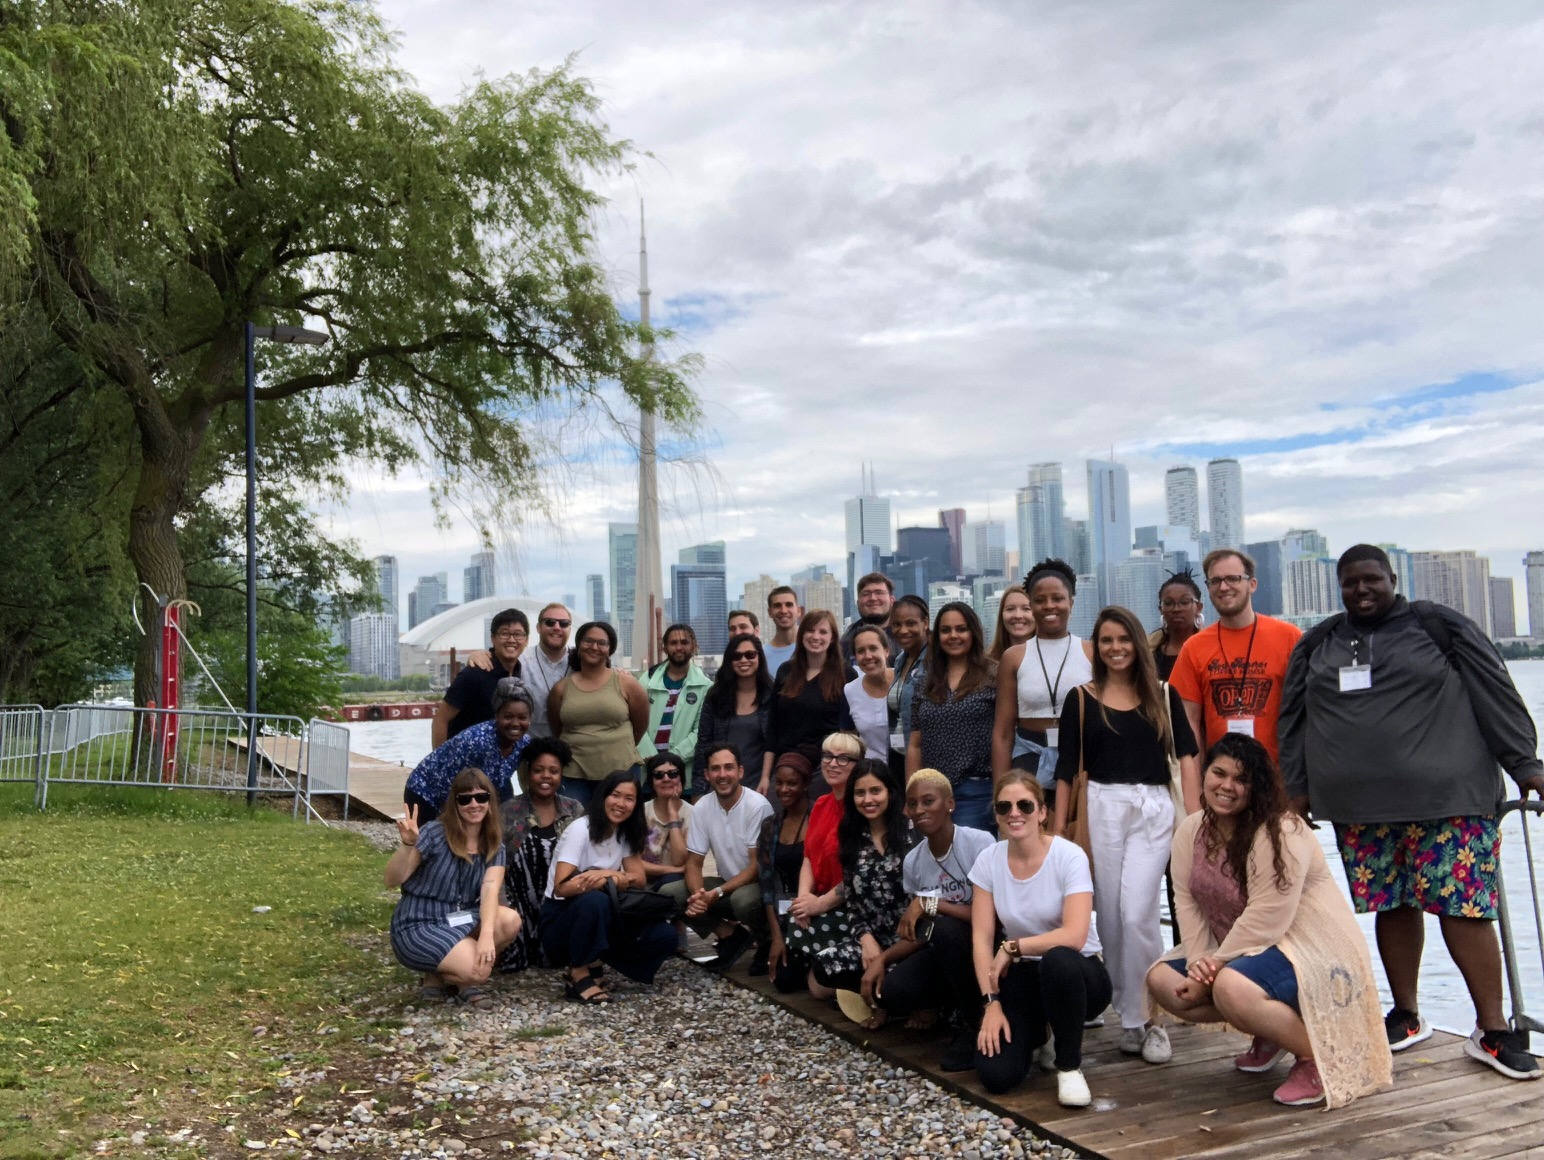 2018 Emerging City Champions in Toronto